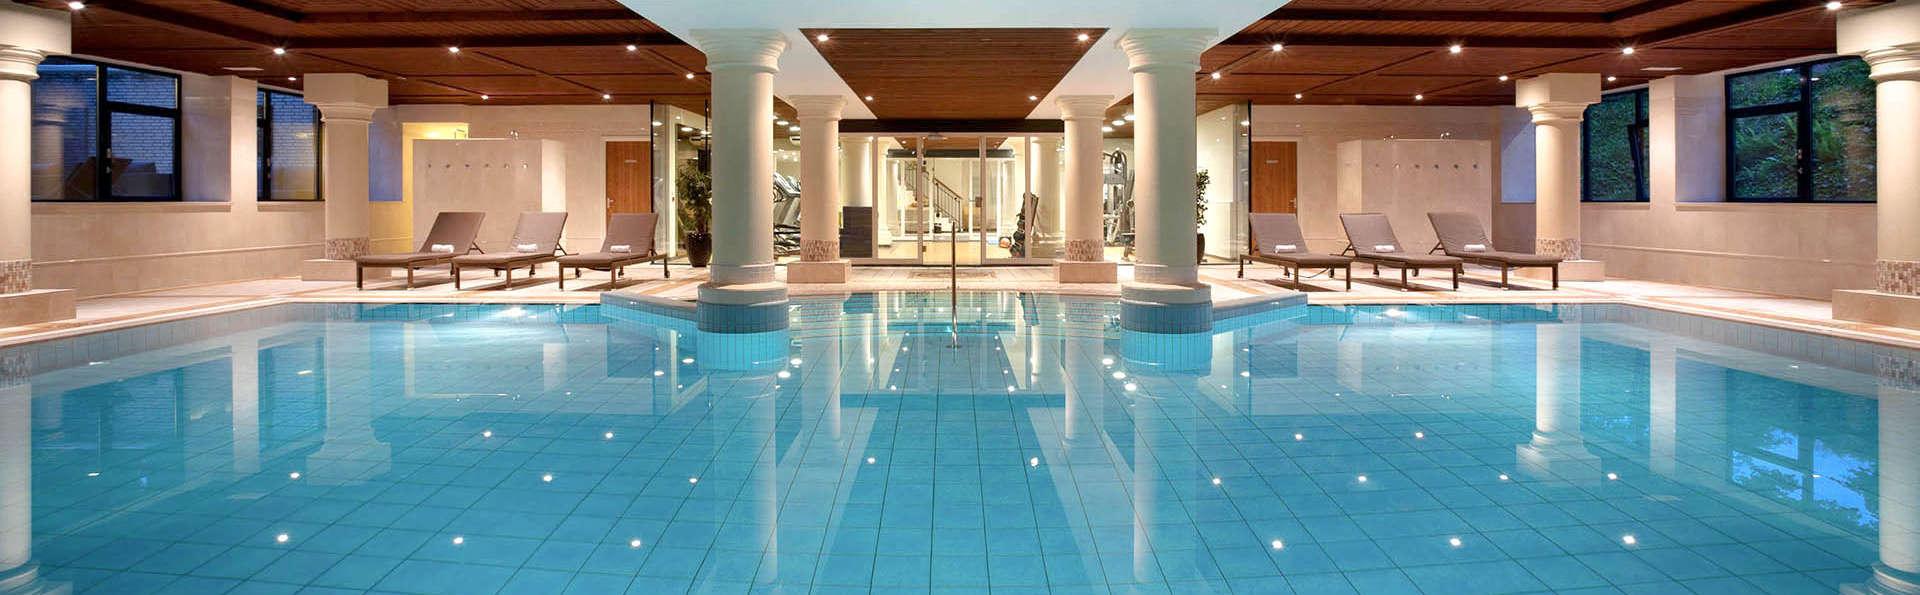 DoubleTree by Hilton Royal Parc Soestduinen - EDIT_POOL_01.jpg